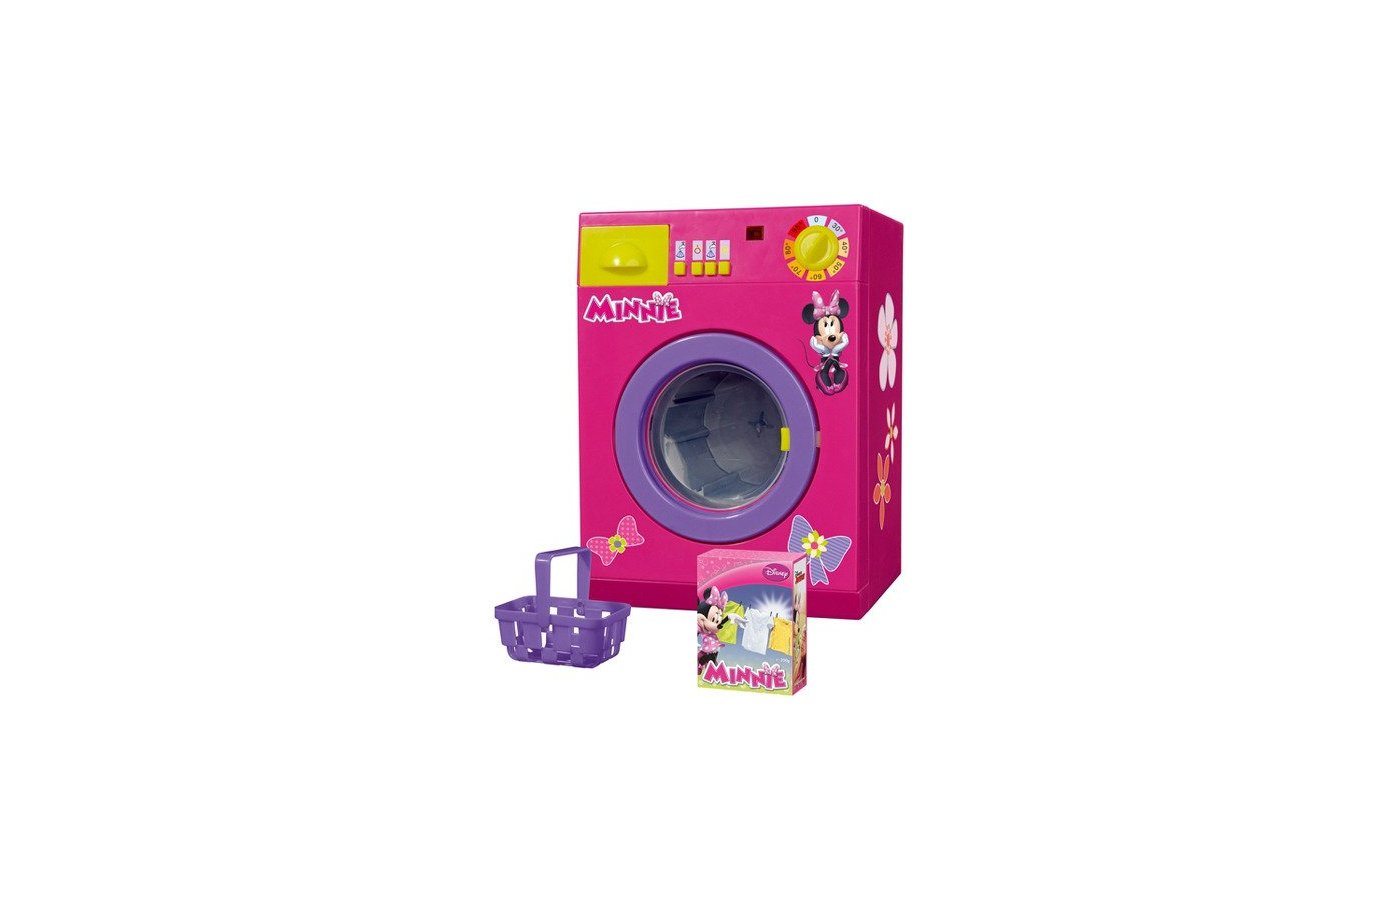 Игрушка SIMBA 4765150 Стиральная машина Minnie Mouse